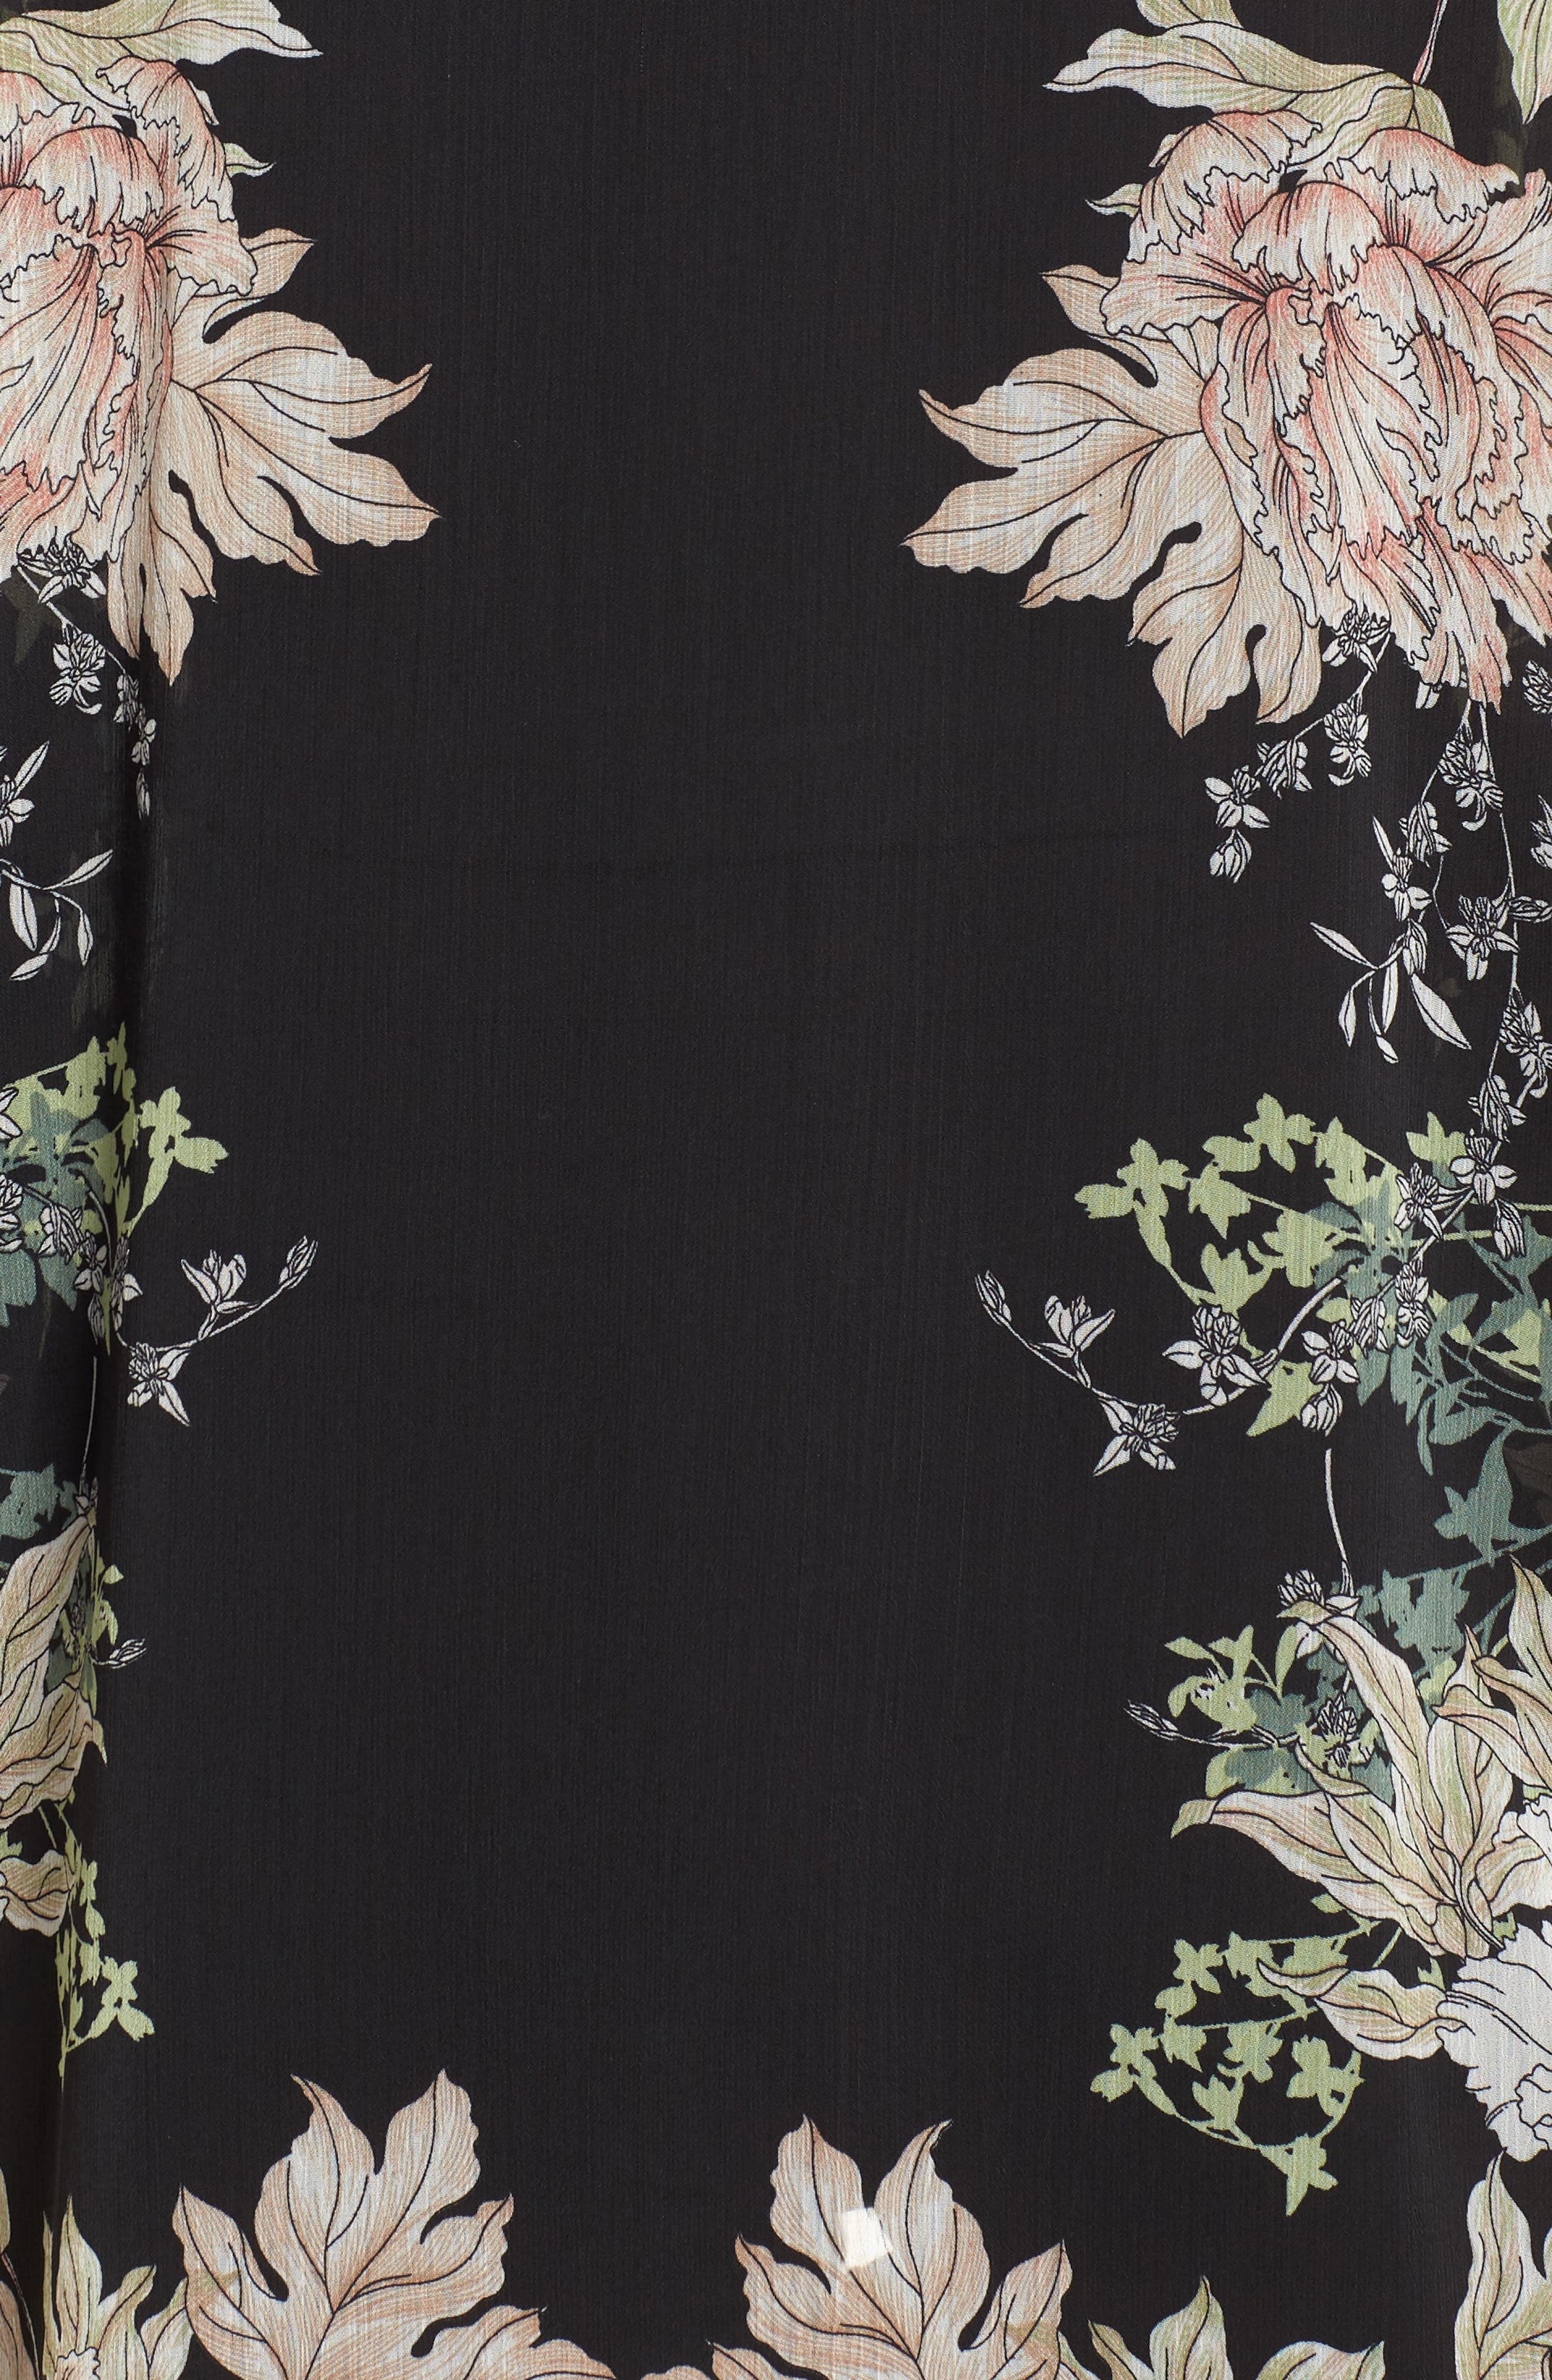 Floral Print Kimono,                             Alternate thumbnail 6, color,                             Black Gold Pink